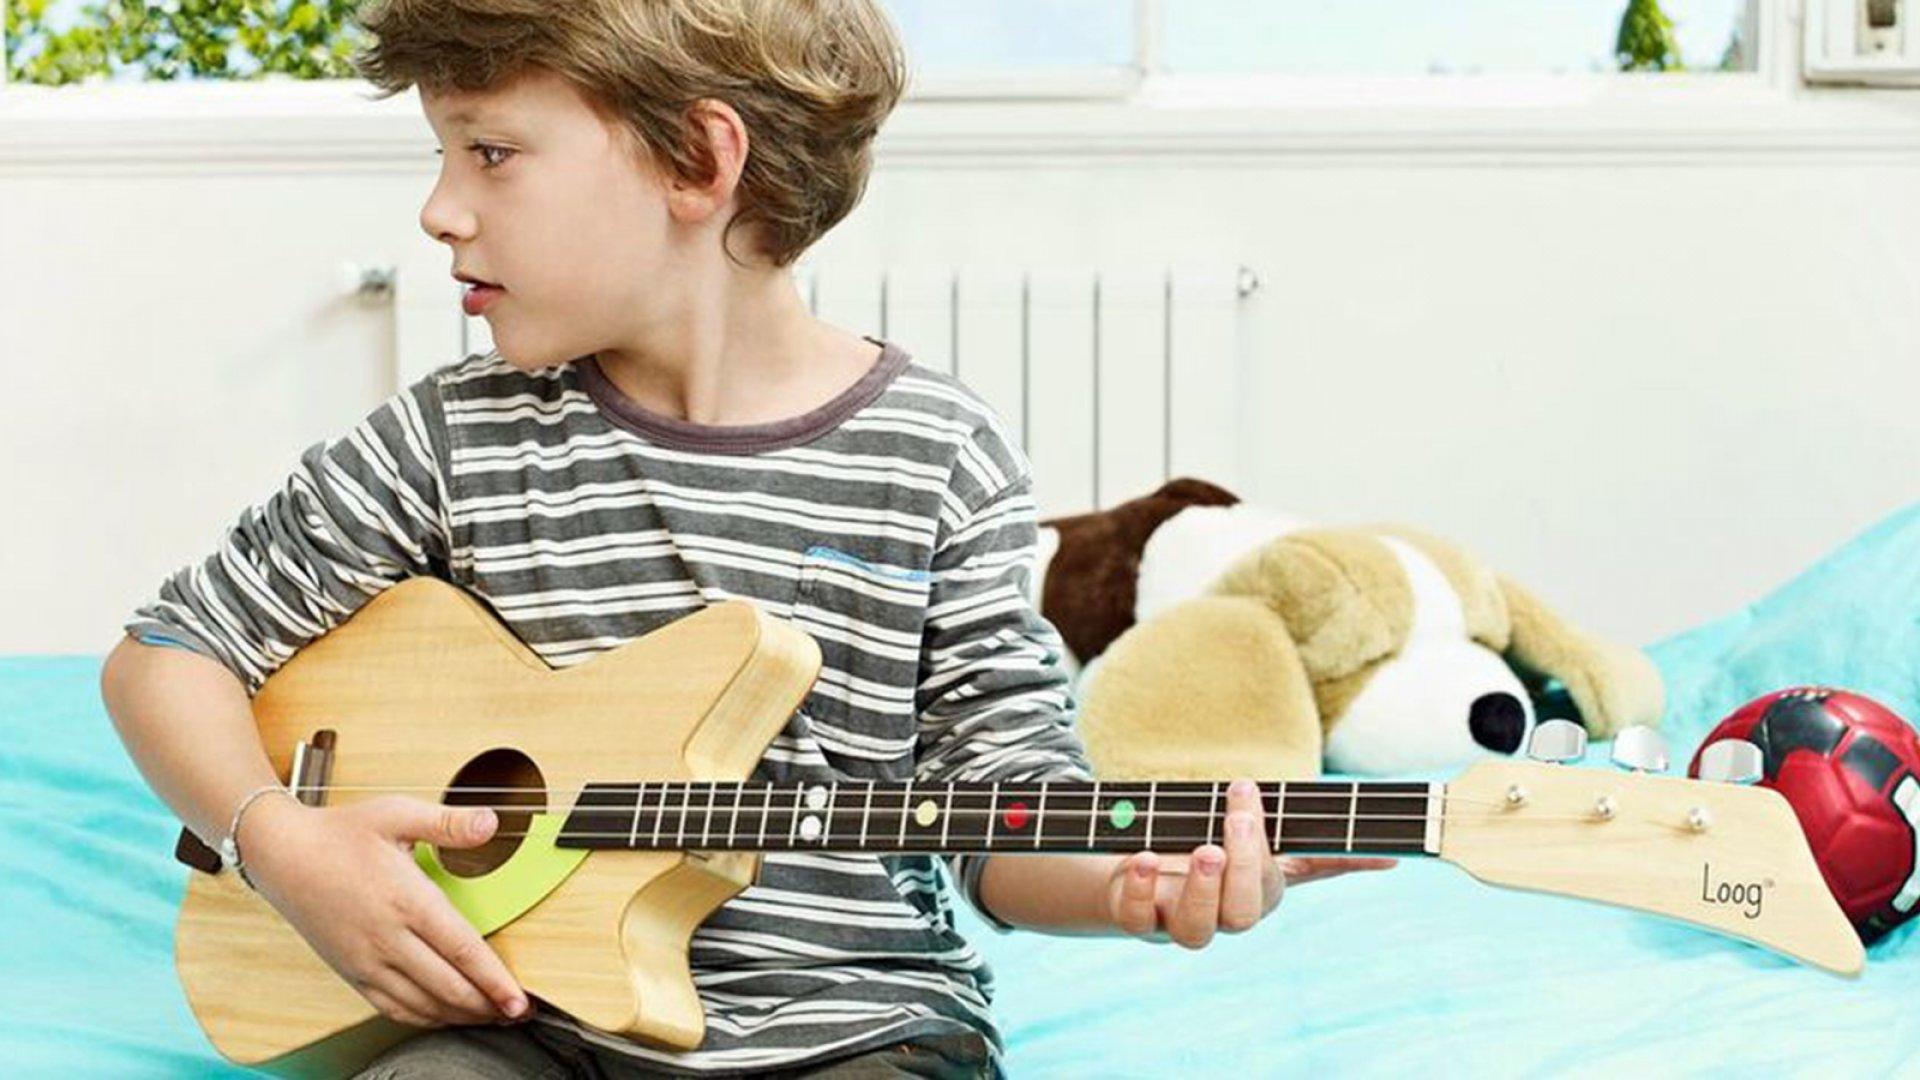 A boy plays his Loog Guitar.